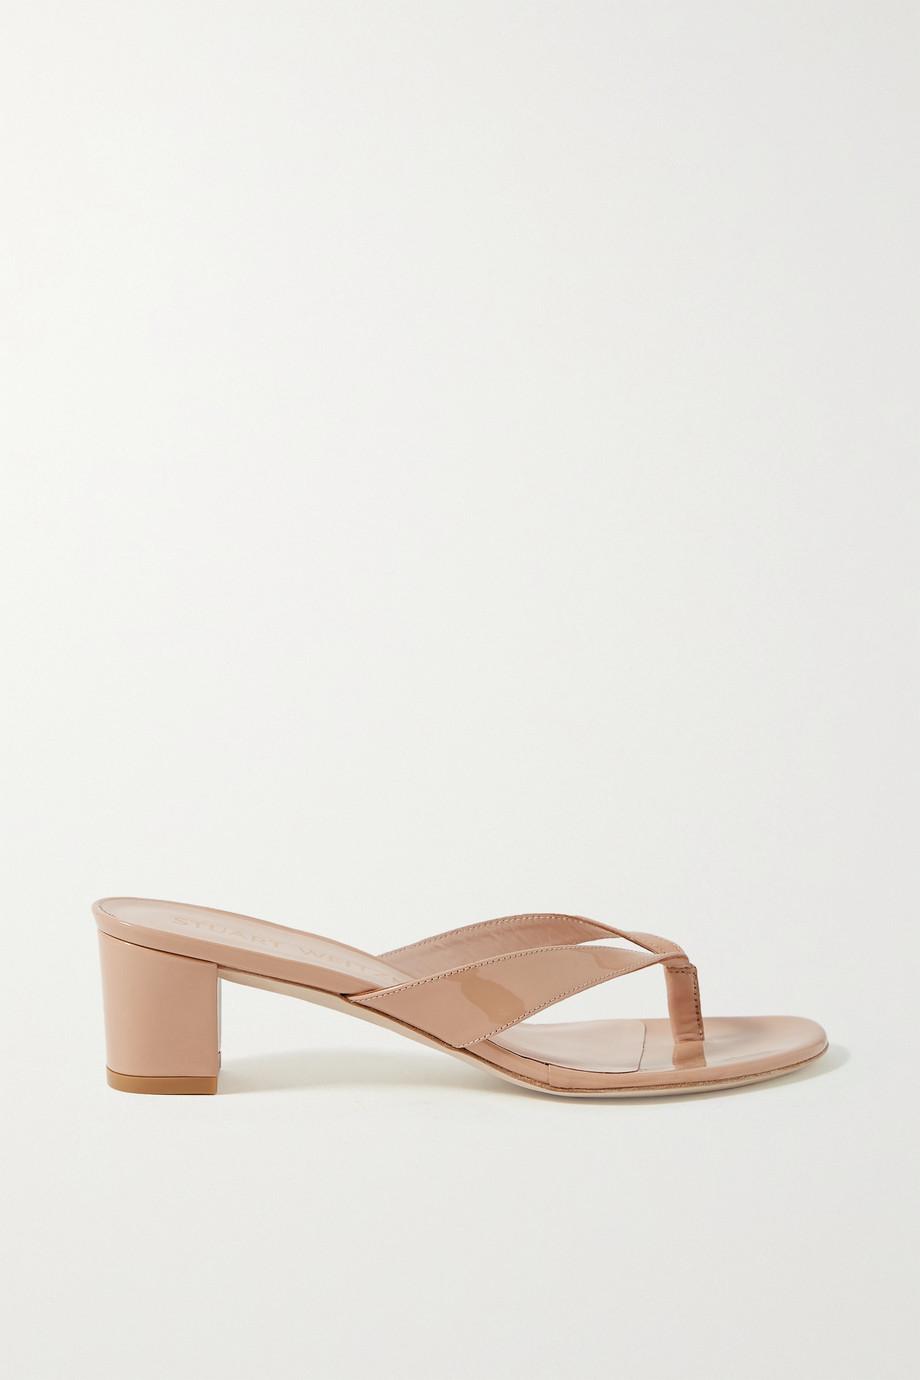 Stuart Weitzman Brigida patent-leather sandals